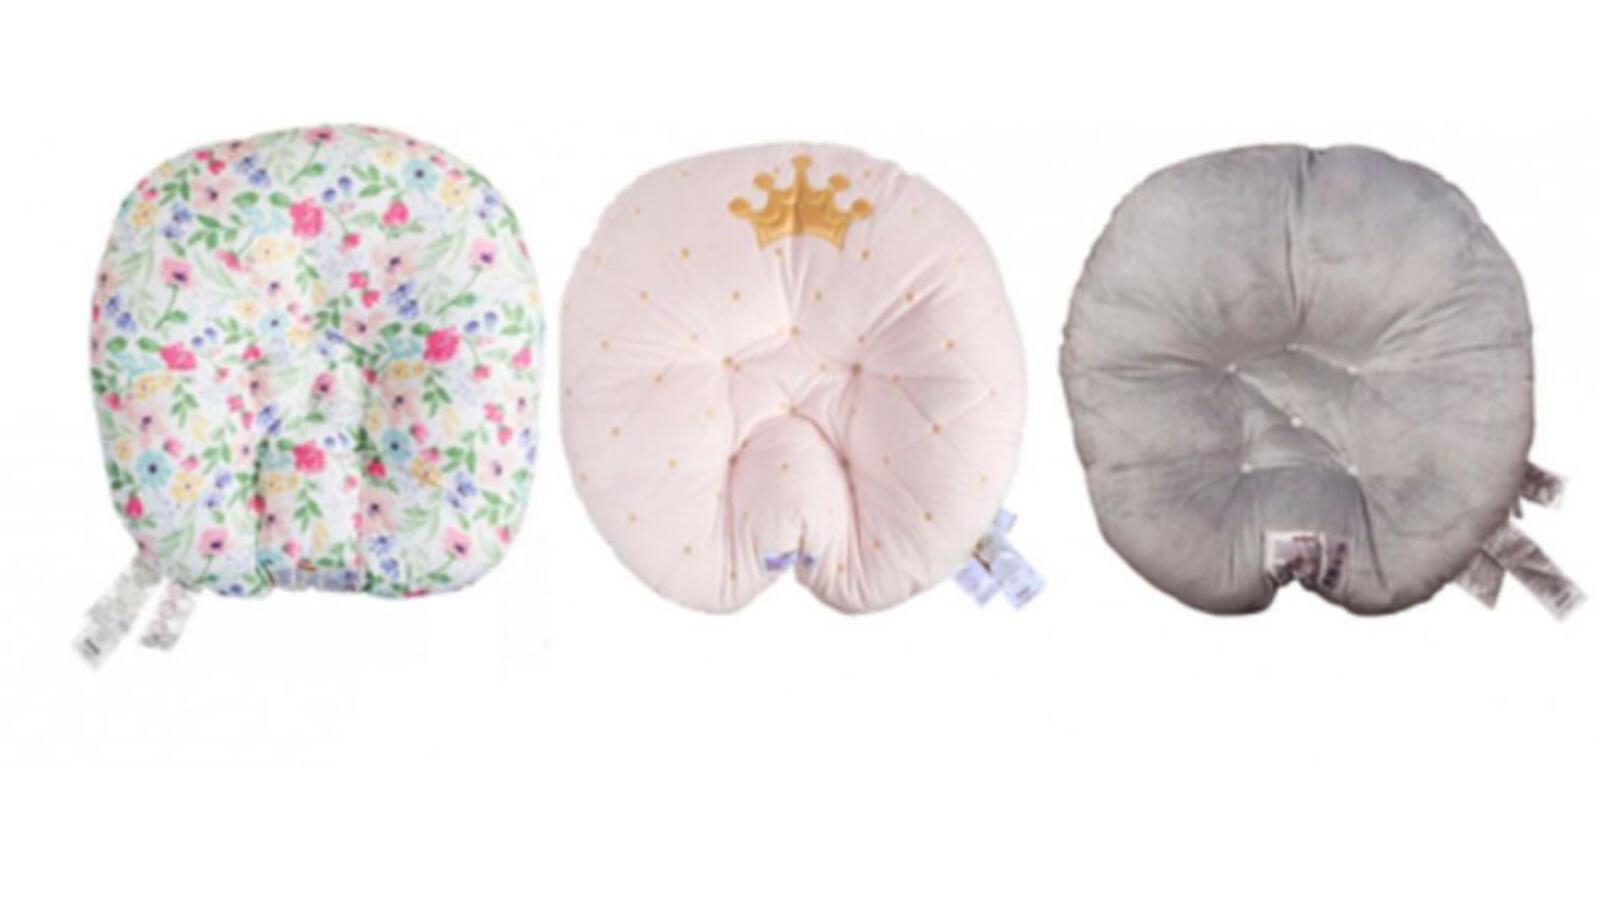 3 Million Boppy Newborn Pillows Recalled After Multiple Infant Deaths